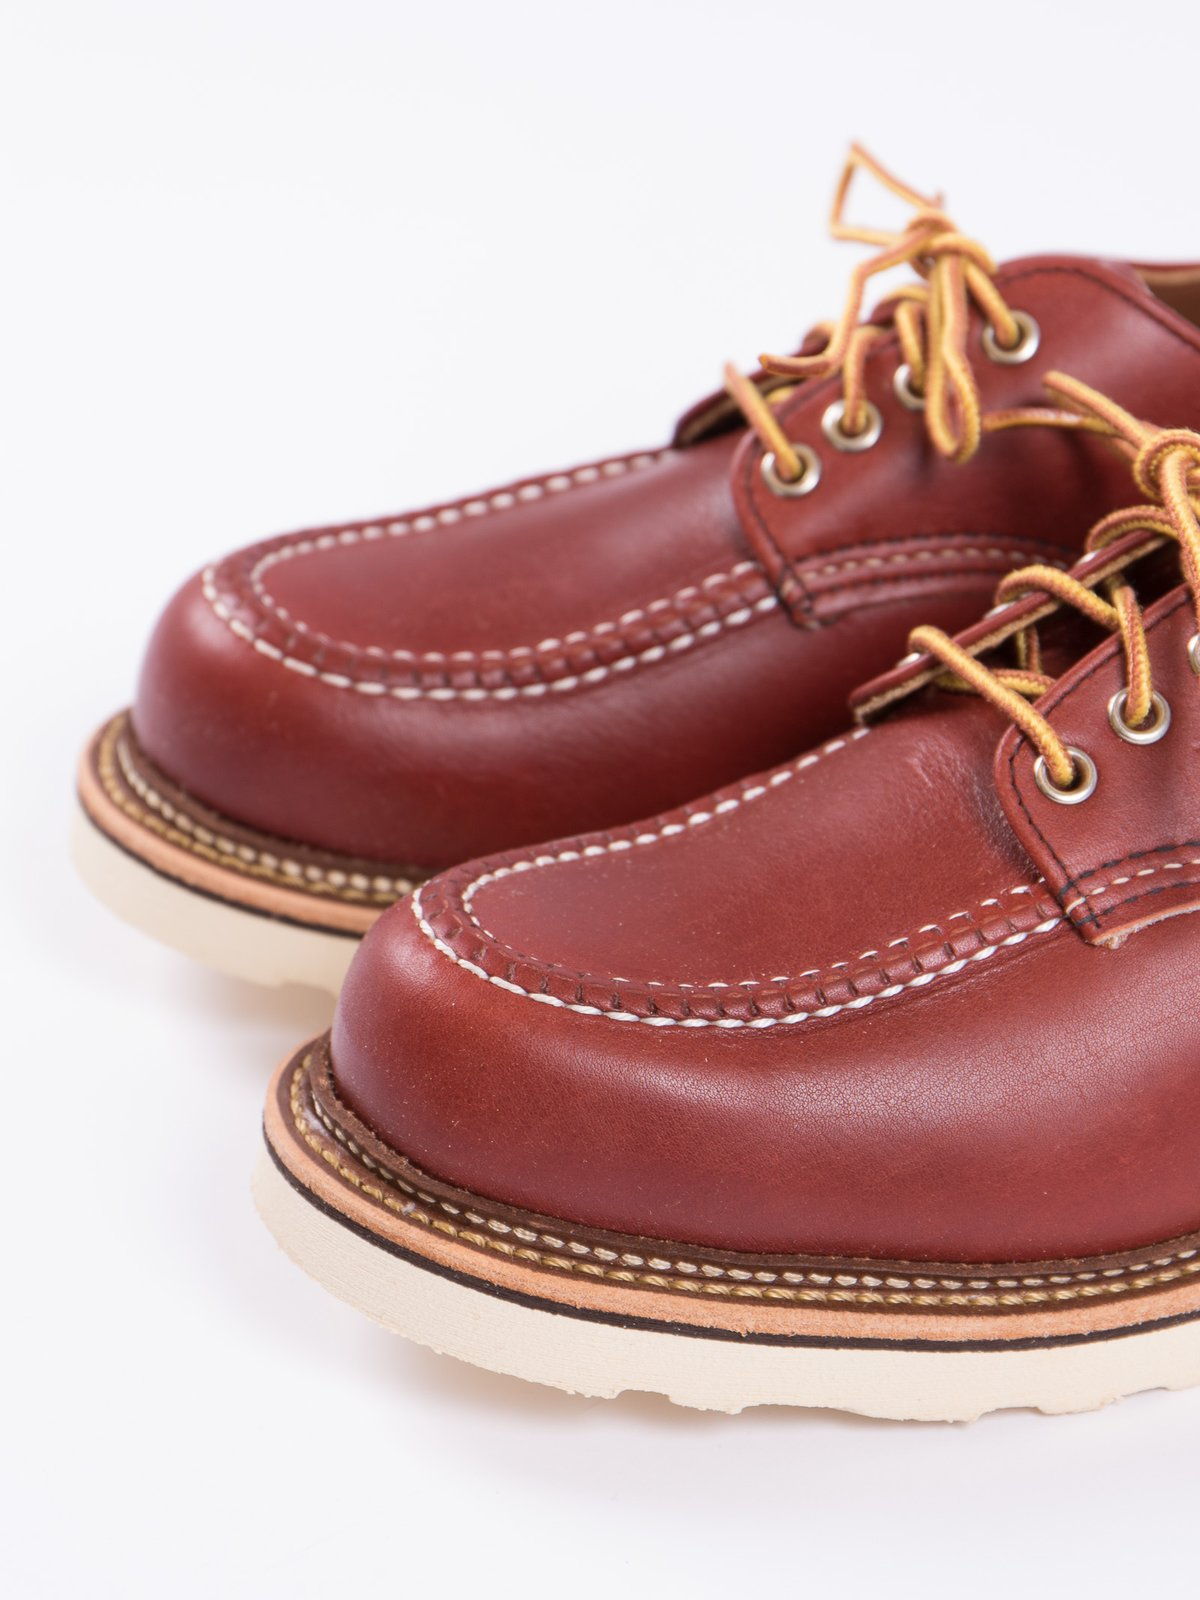 Oro Russet Portage 8103 Classic Oxford Shoe - Image 2